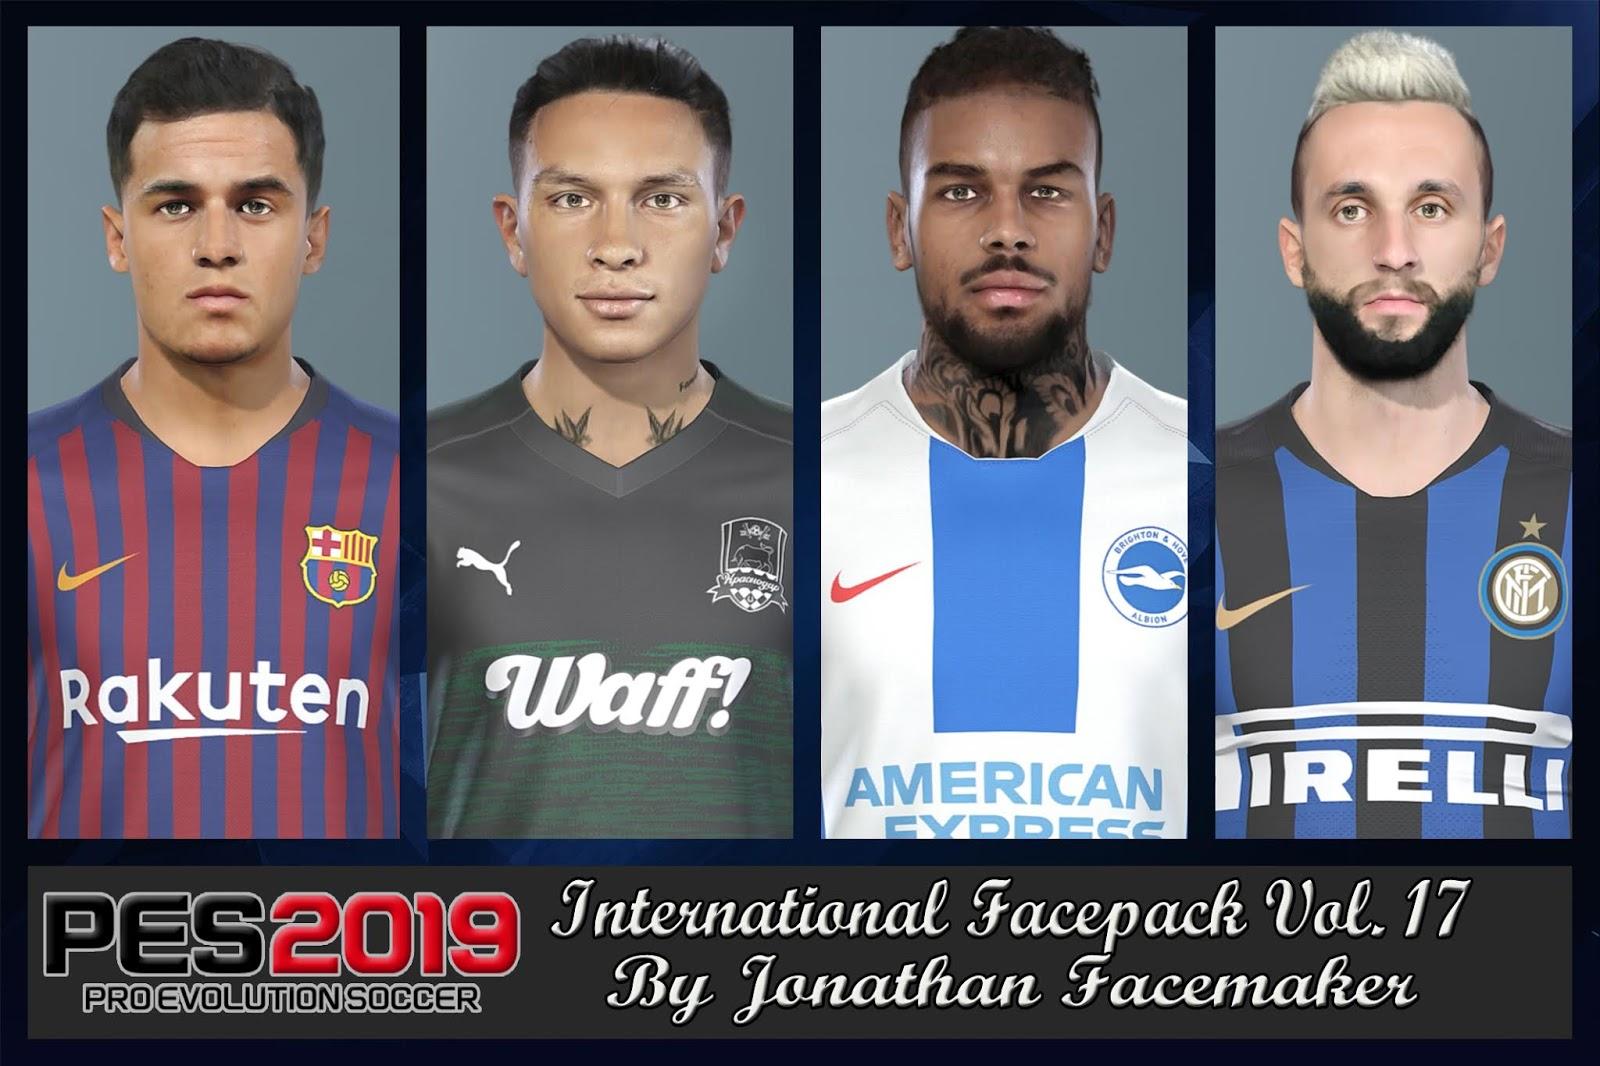 PES 2019 International Facepack Vol 17 by Jonathan Facemaker